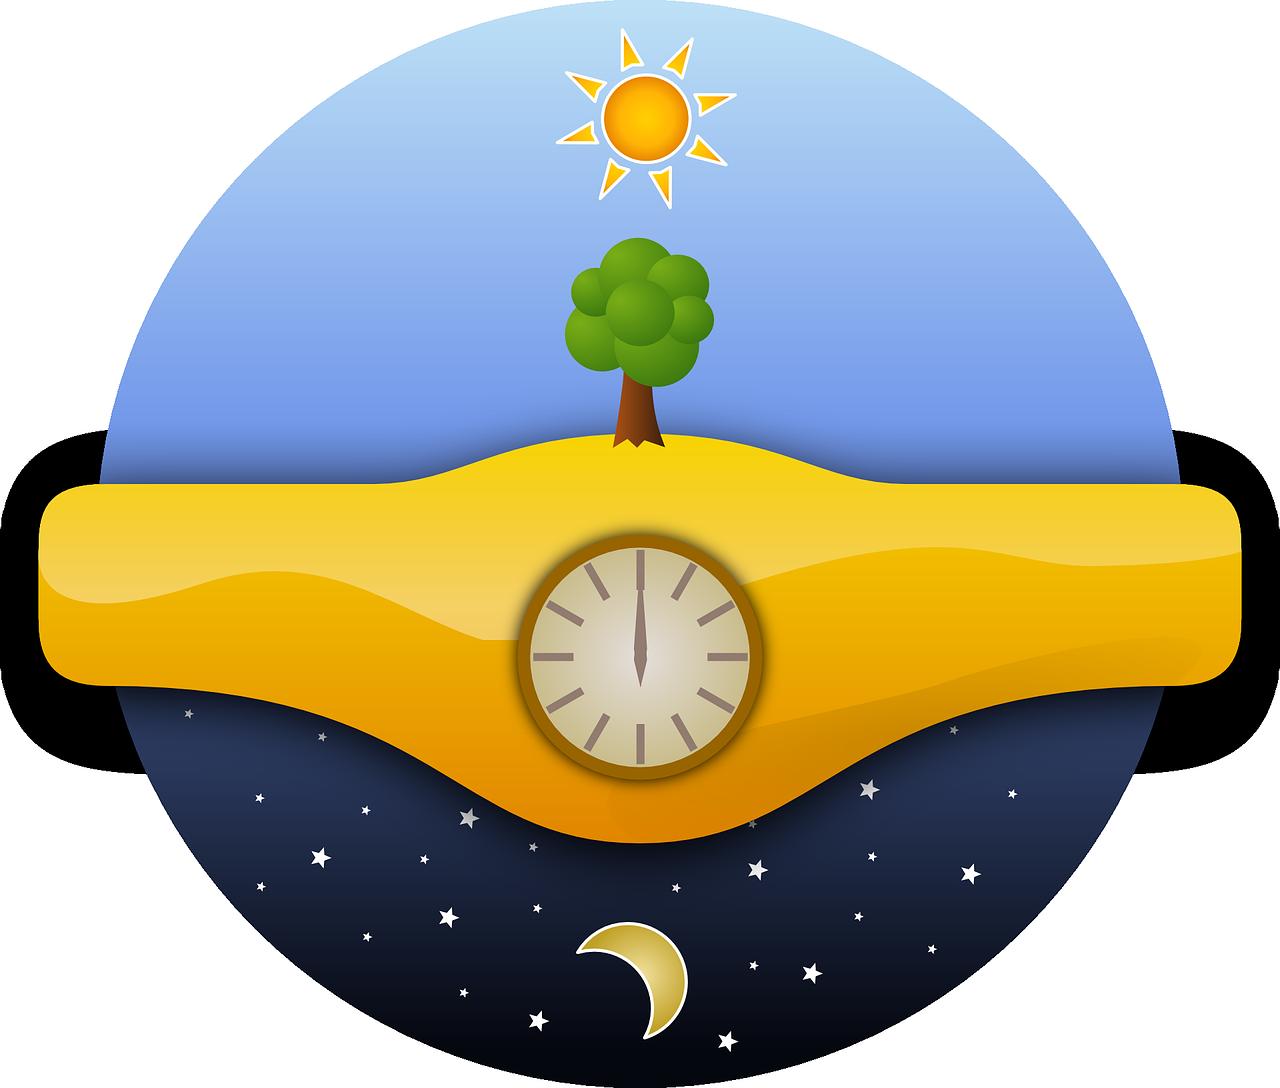 sun, tree, watch